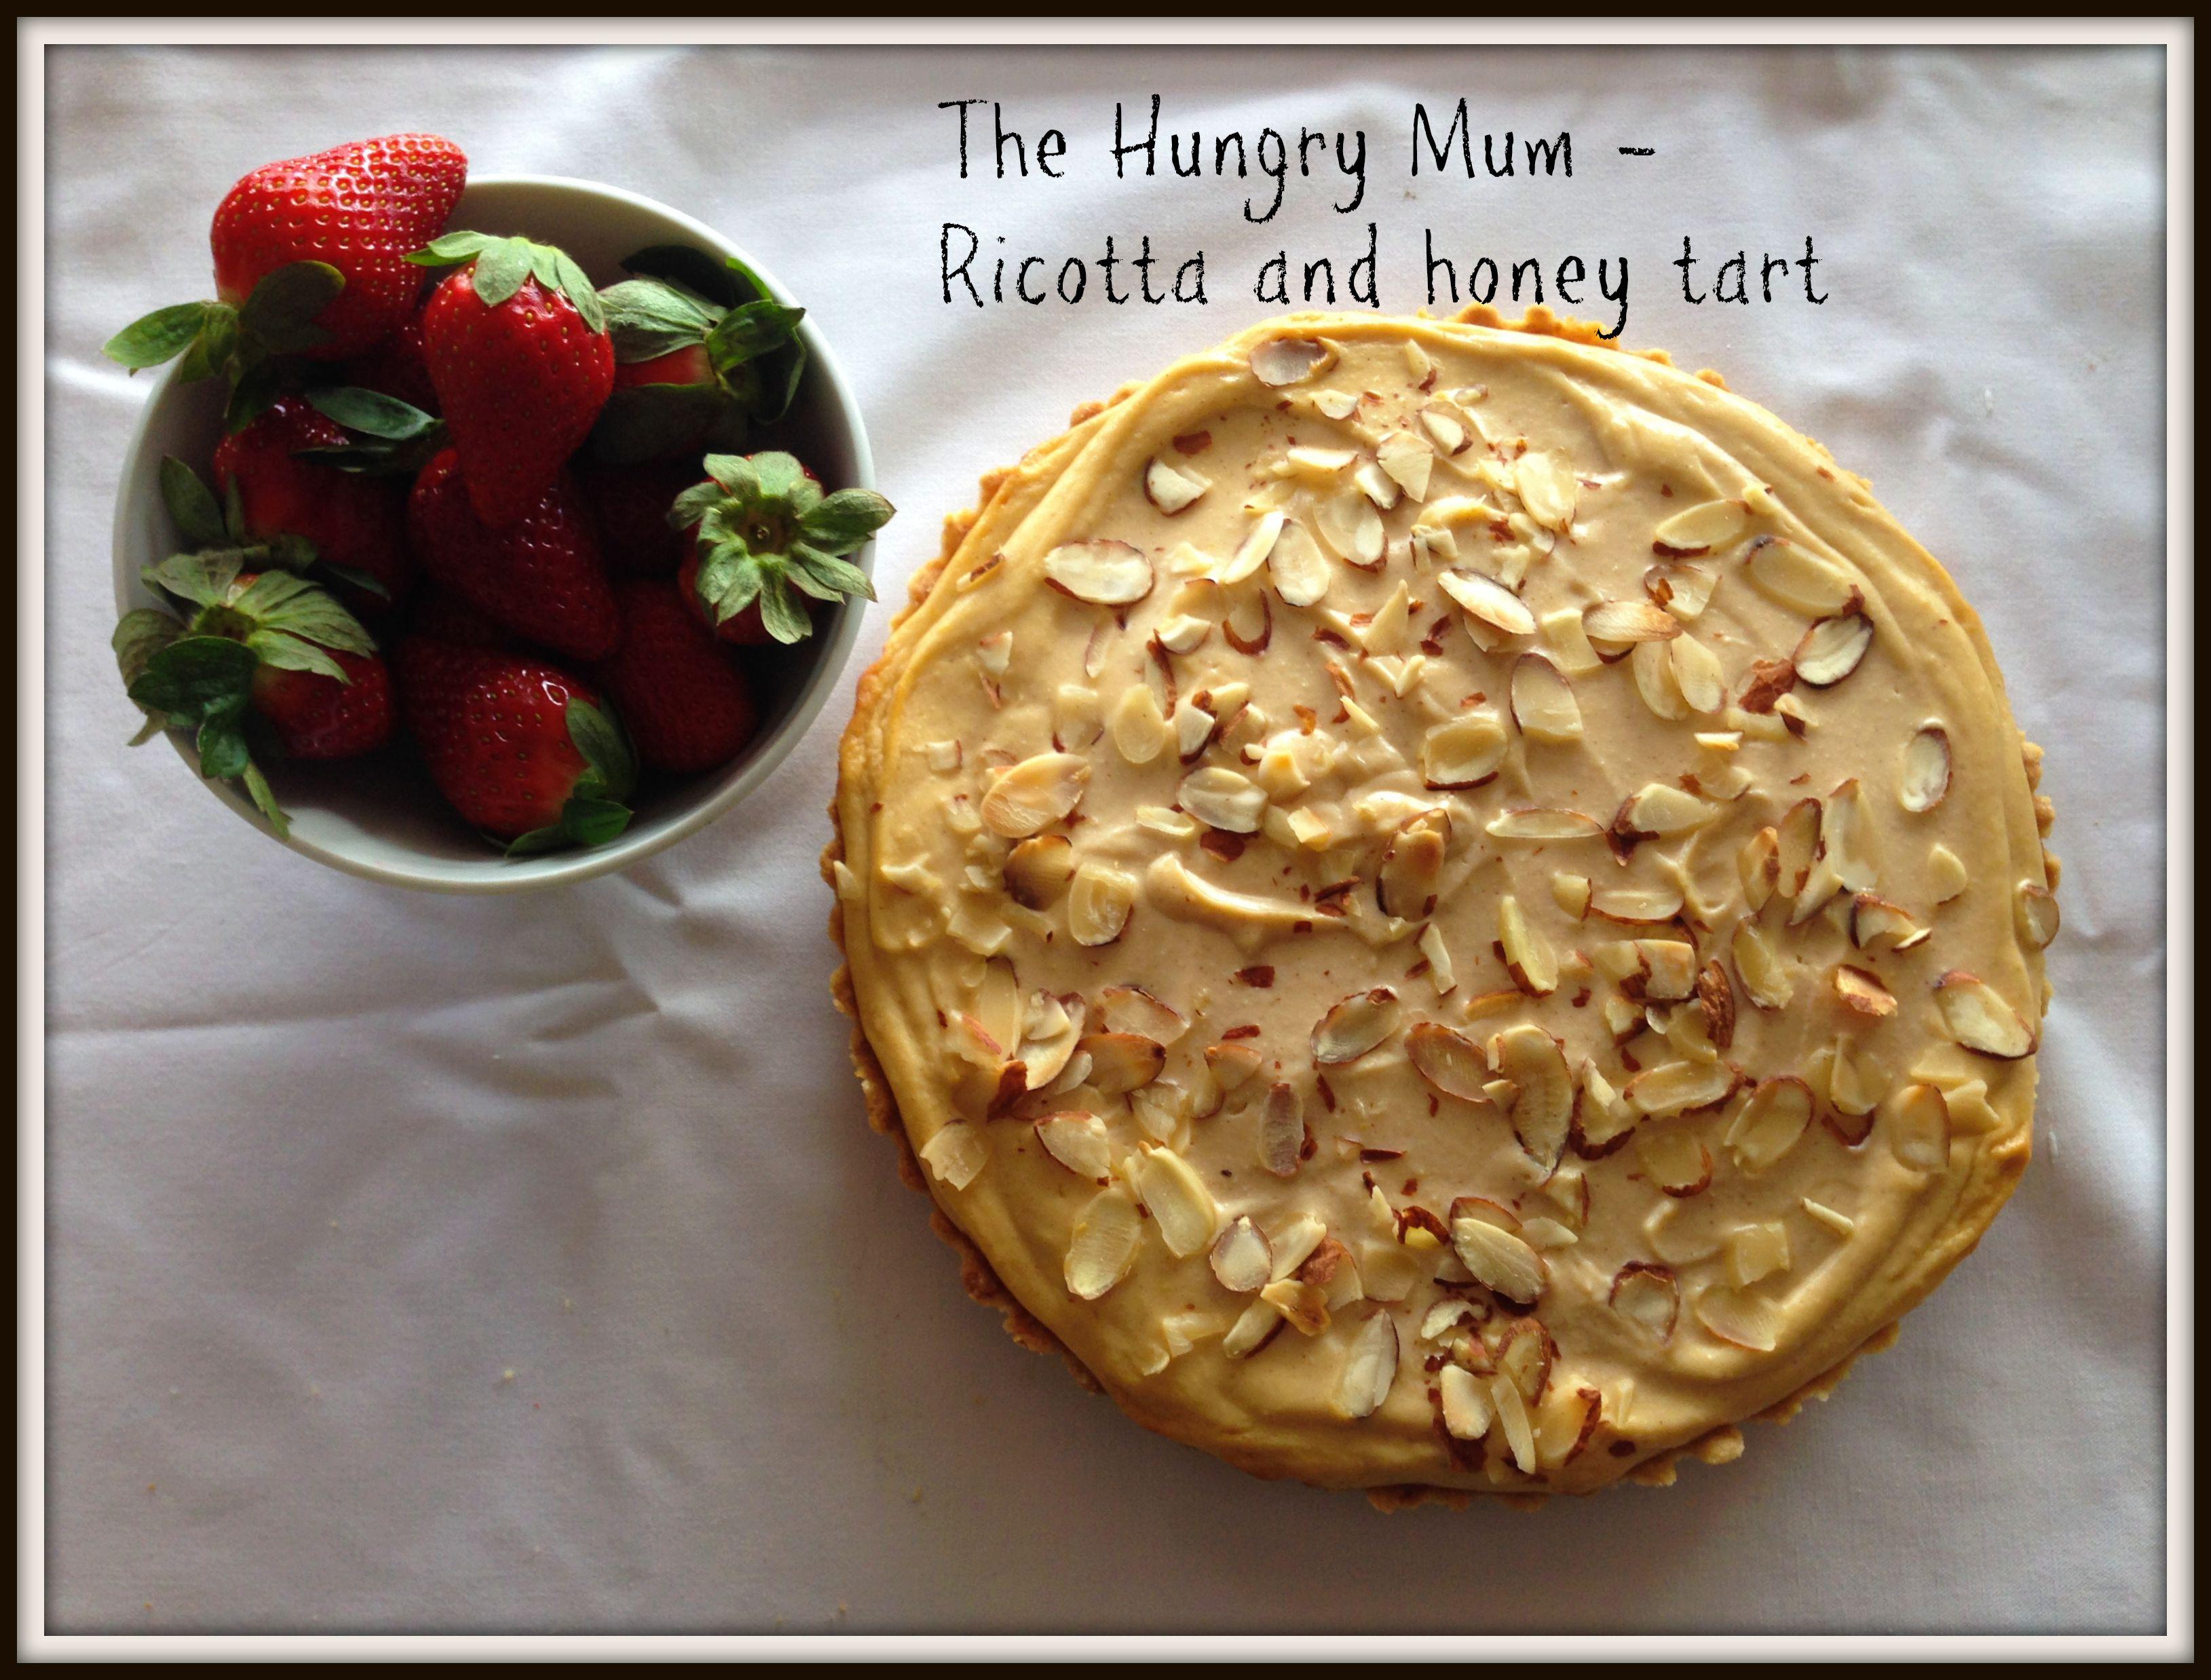 Ricotta and honey tart – a perfect dessert recipe | the hungry mum